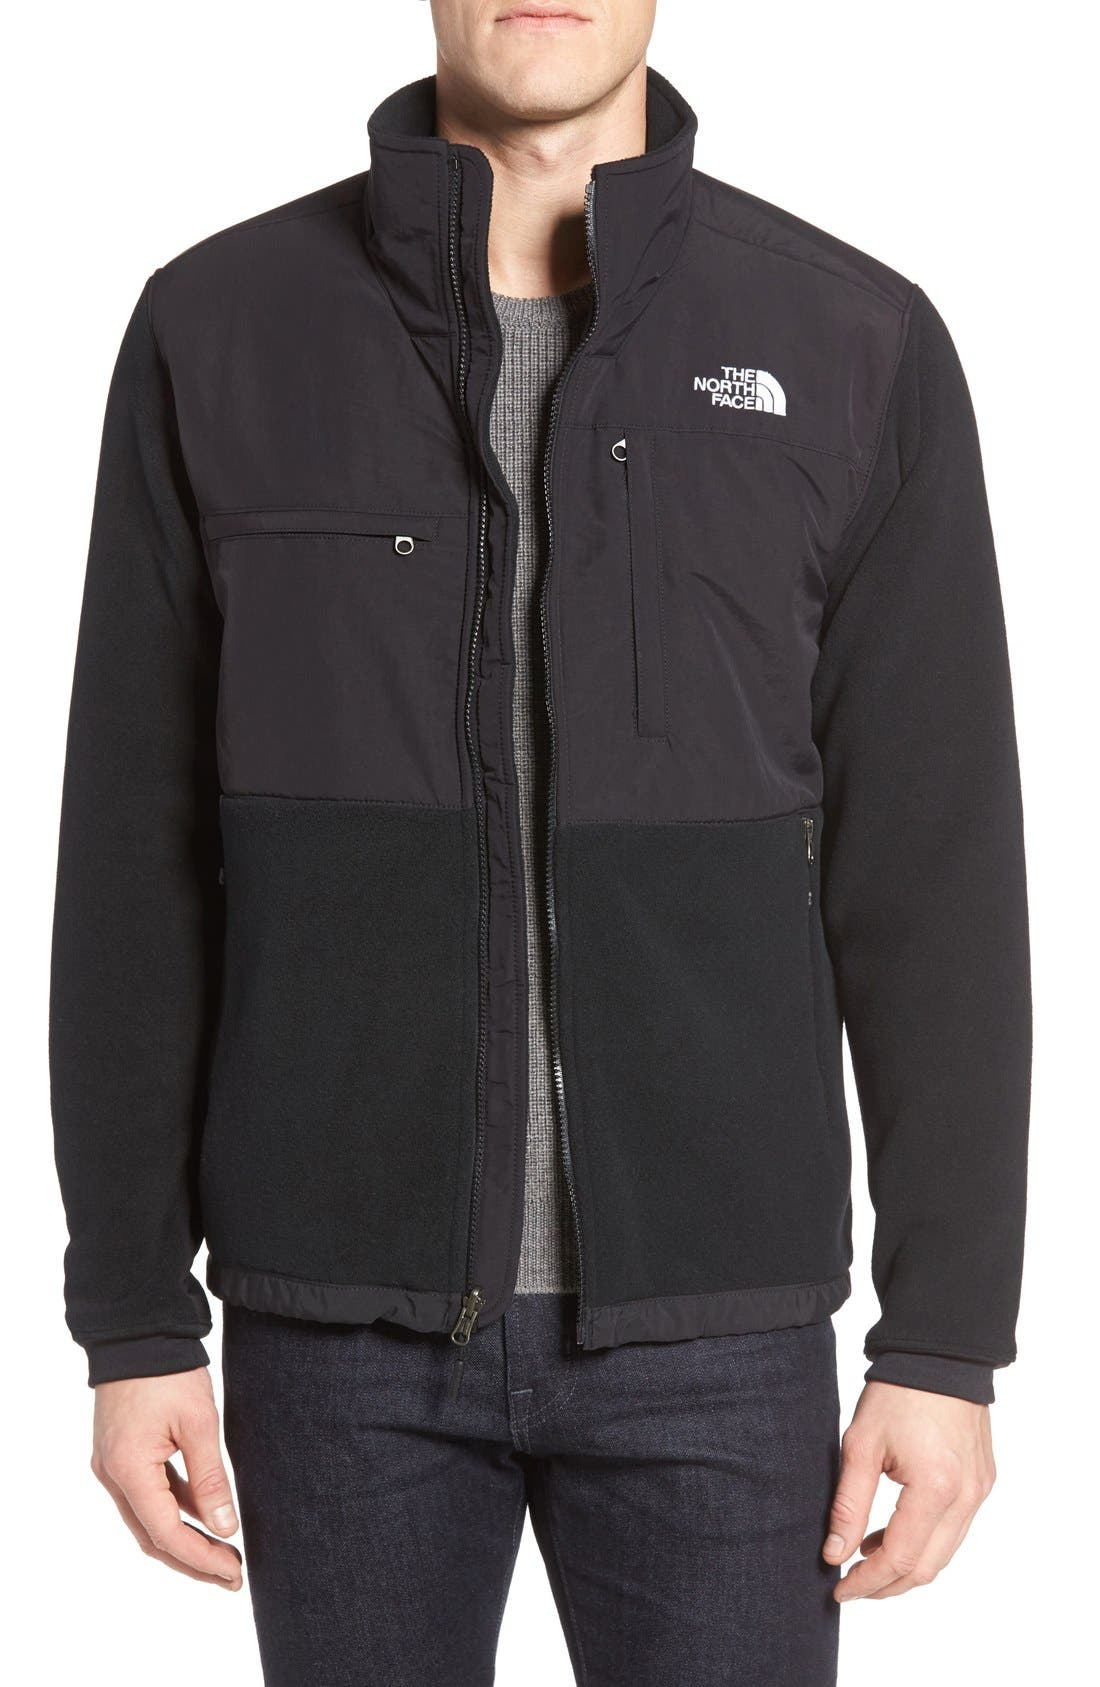 Denali 2 Recycled Fleece Jacket,                             Main thumbnail 1, color,                             001